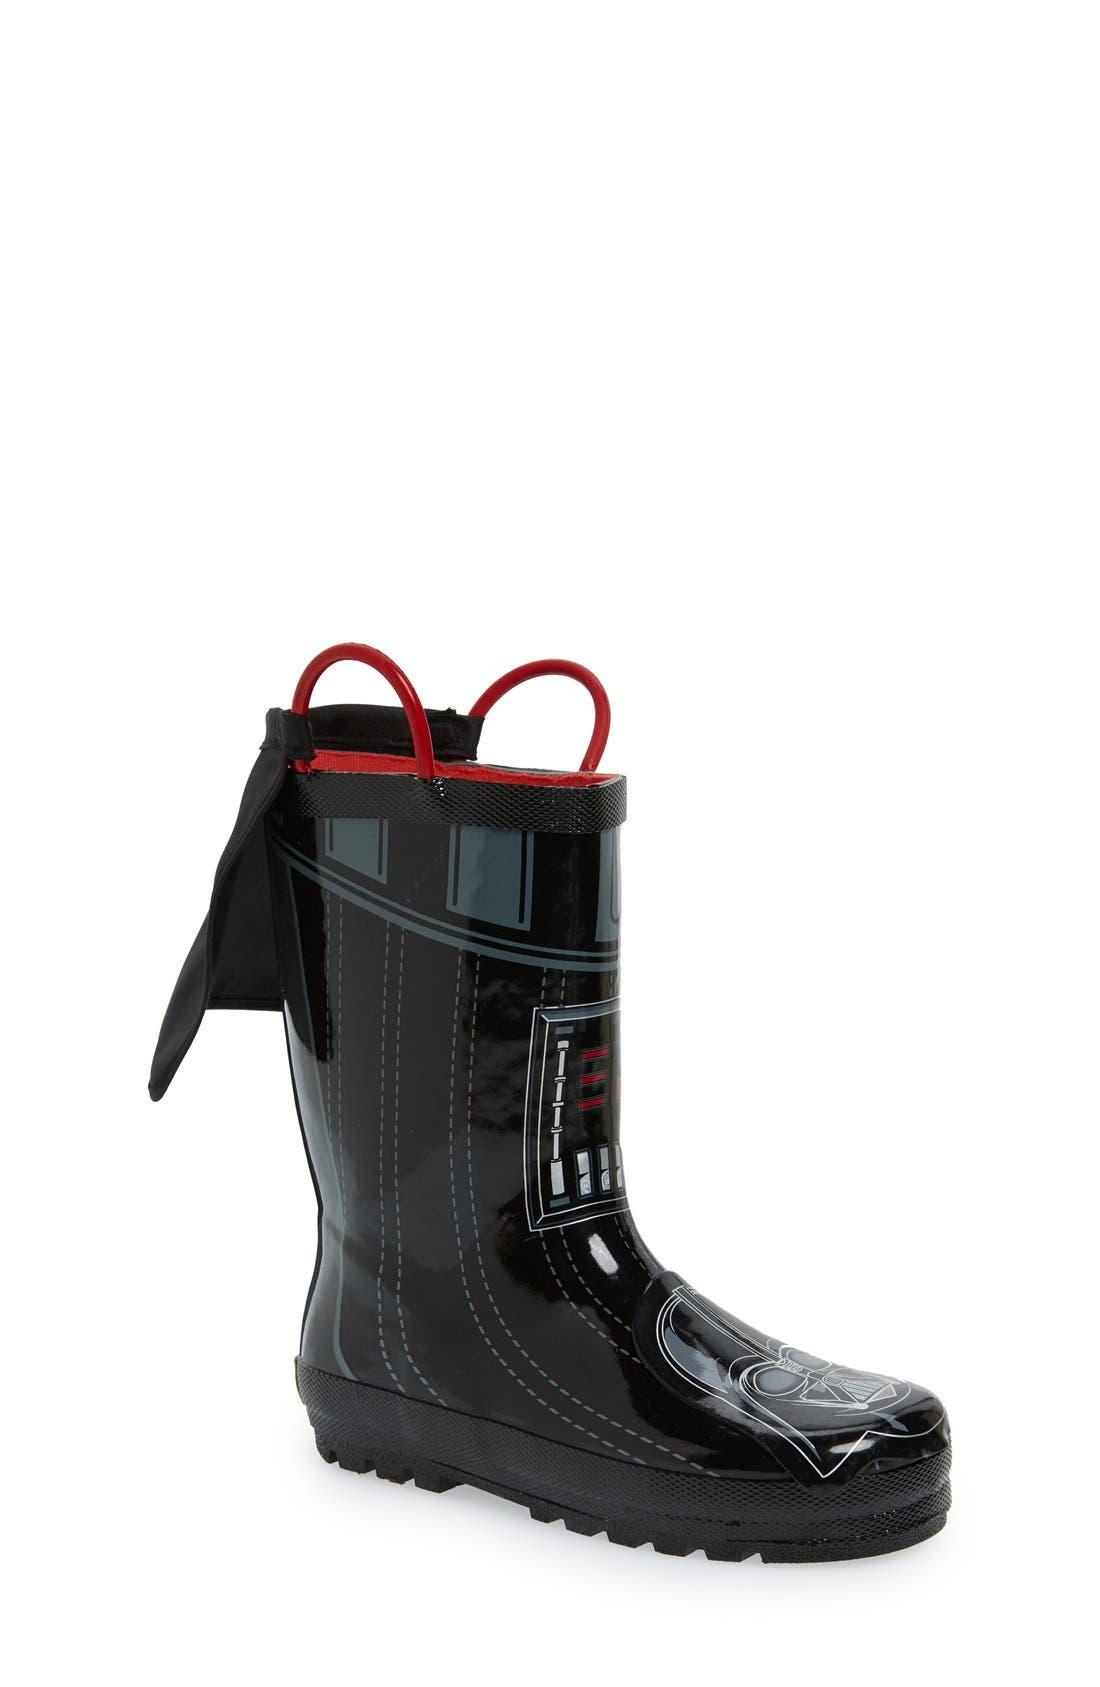 Western Chief 'Star Wars™ - Darth Vader' Waterproof Rain Boot (Walker, Toddler, Little Kid & Big Kid)